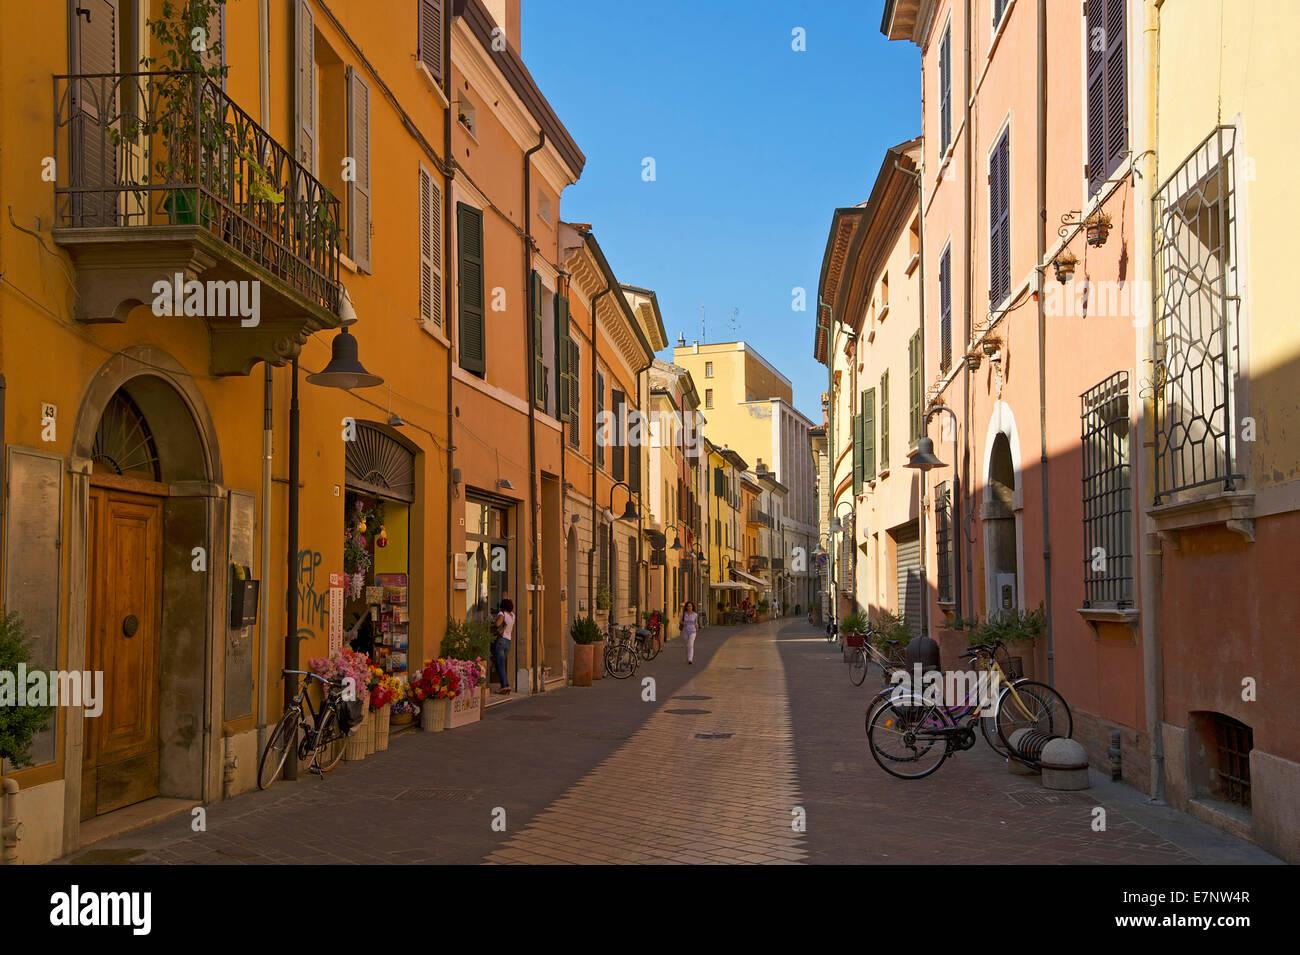 Adriatic, Italy, Europe, outside, day, nobody, Emilia-Romagna, Ravenna, lane, house, home, building, architecture - Stock Image